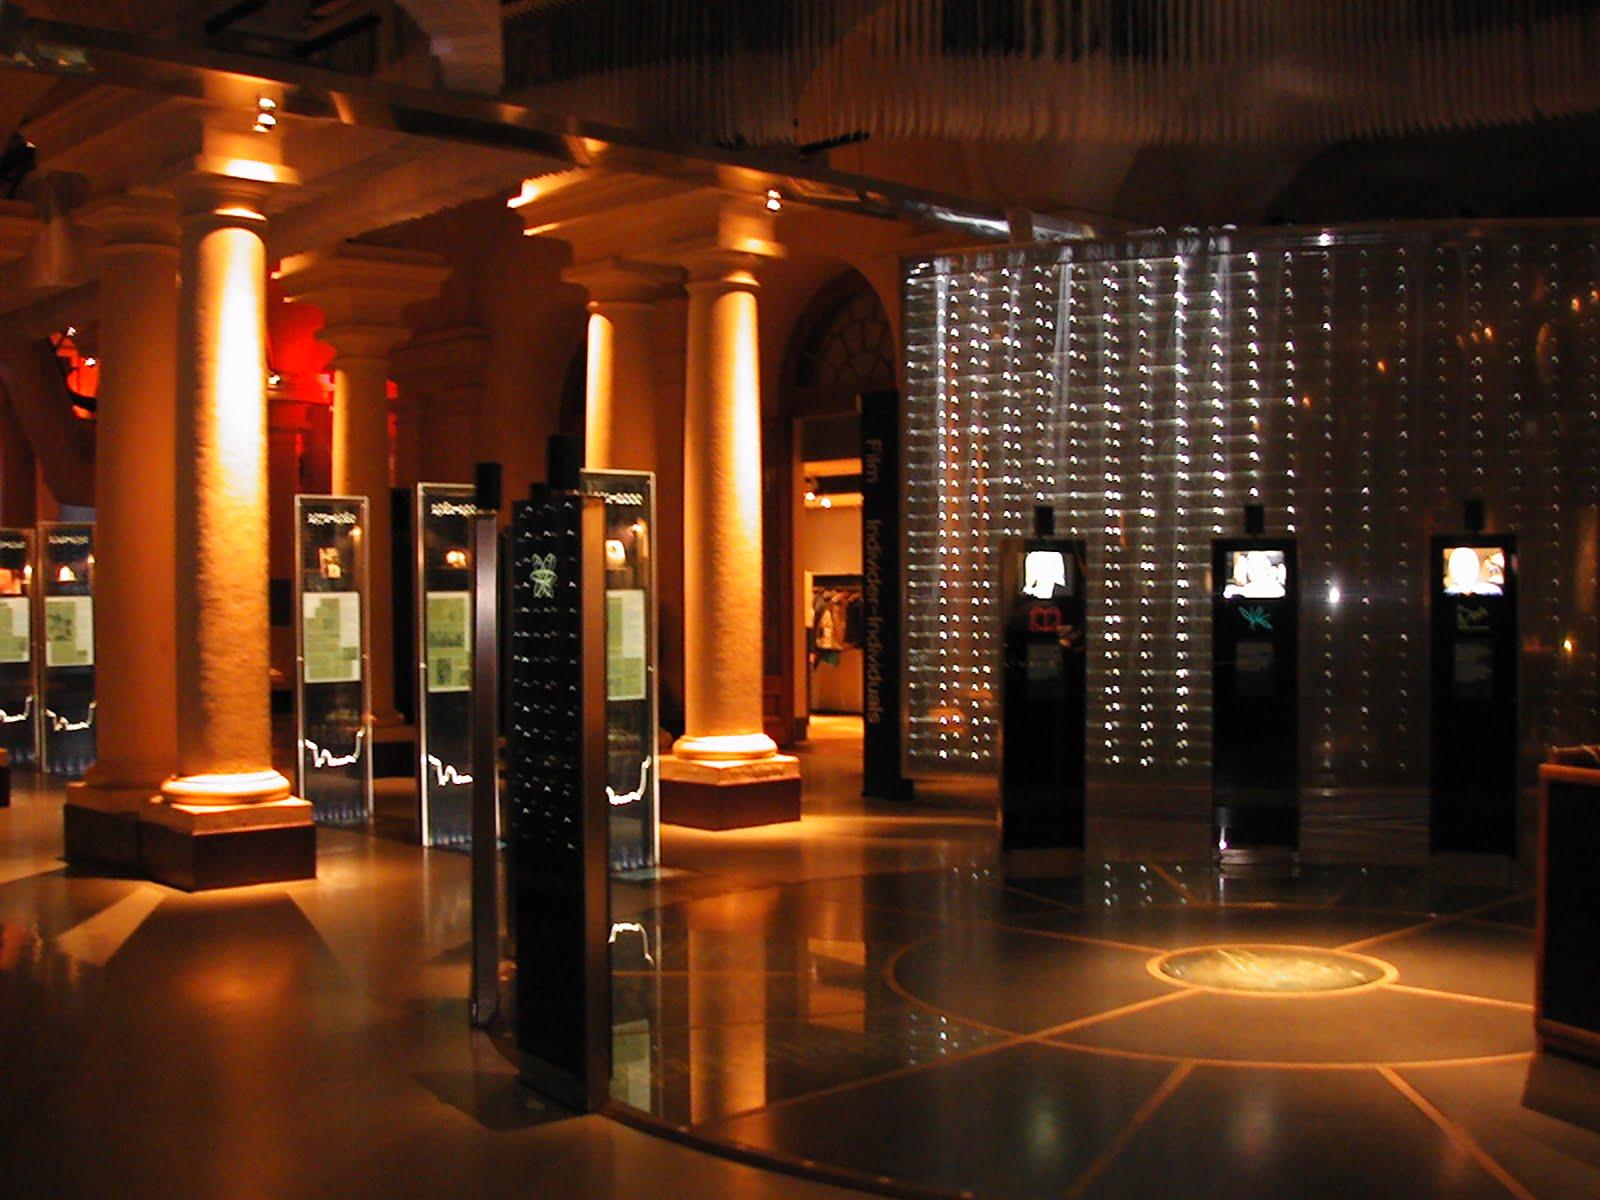 Interior del museo Nobel